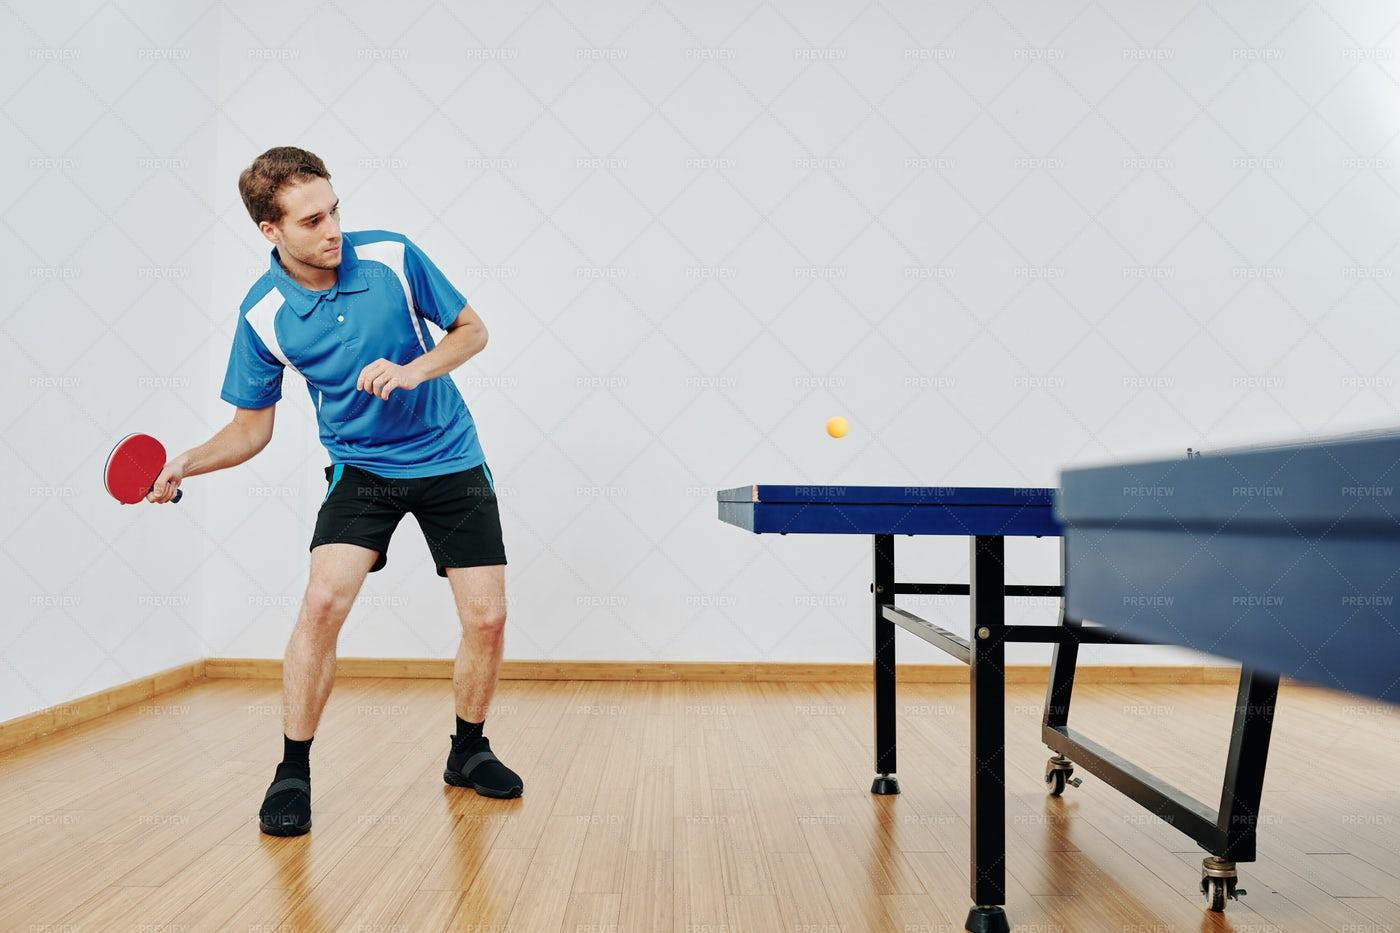 Tennis Player Hitting Ball: Stock Photos